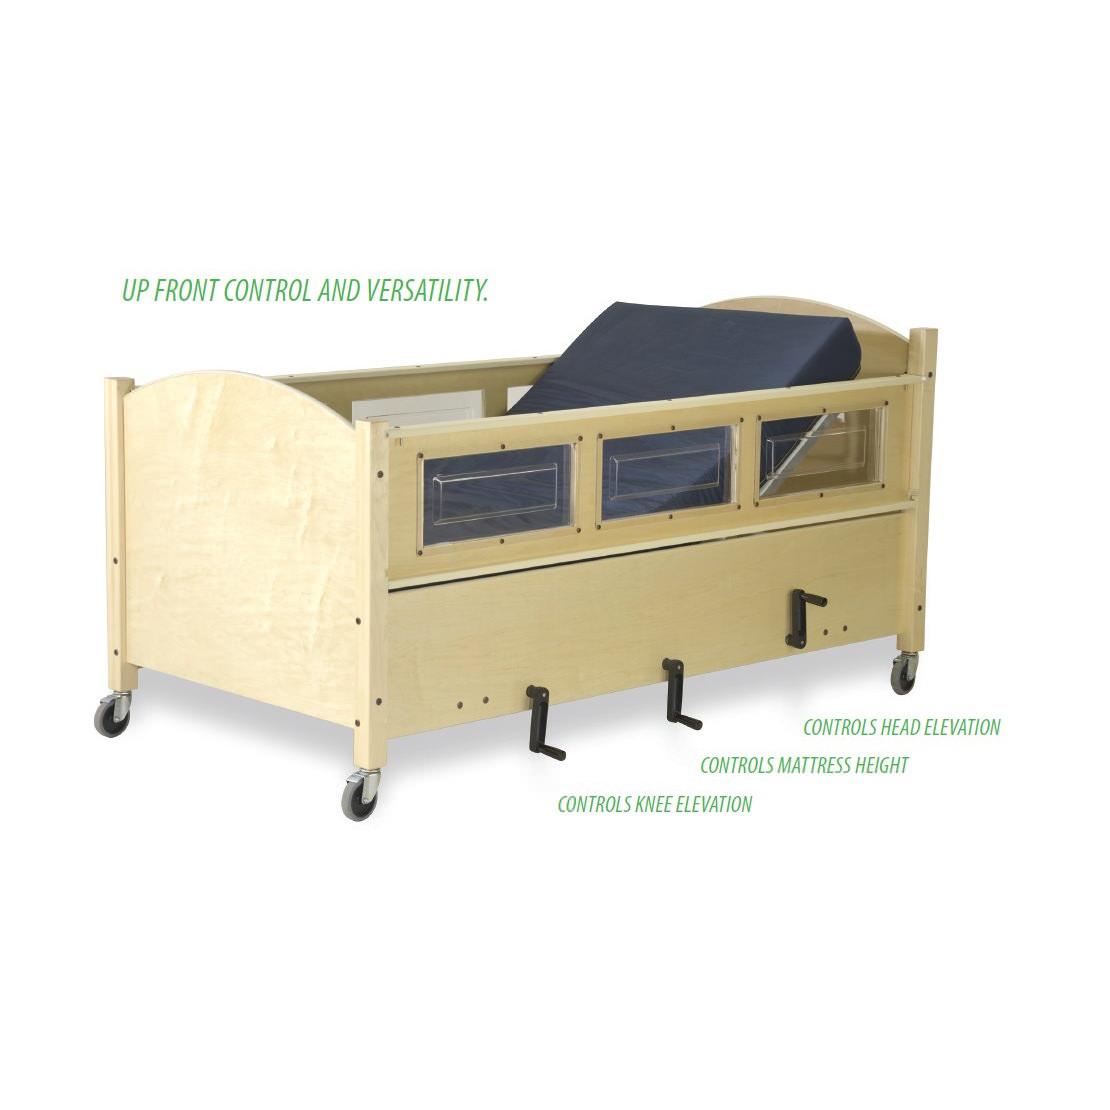 SleepSafe2 articulating medium bed